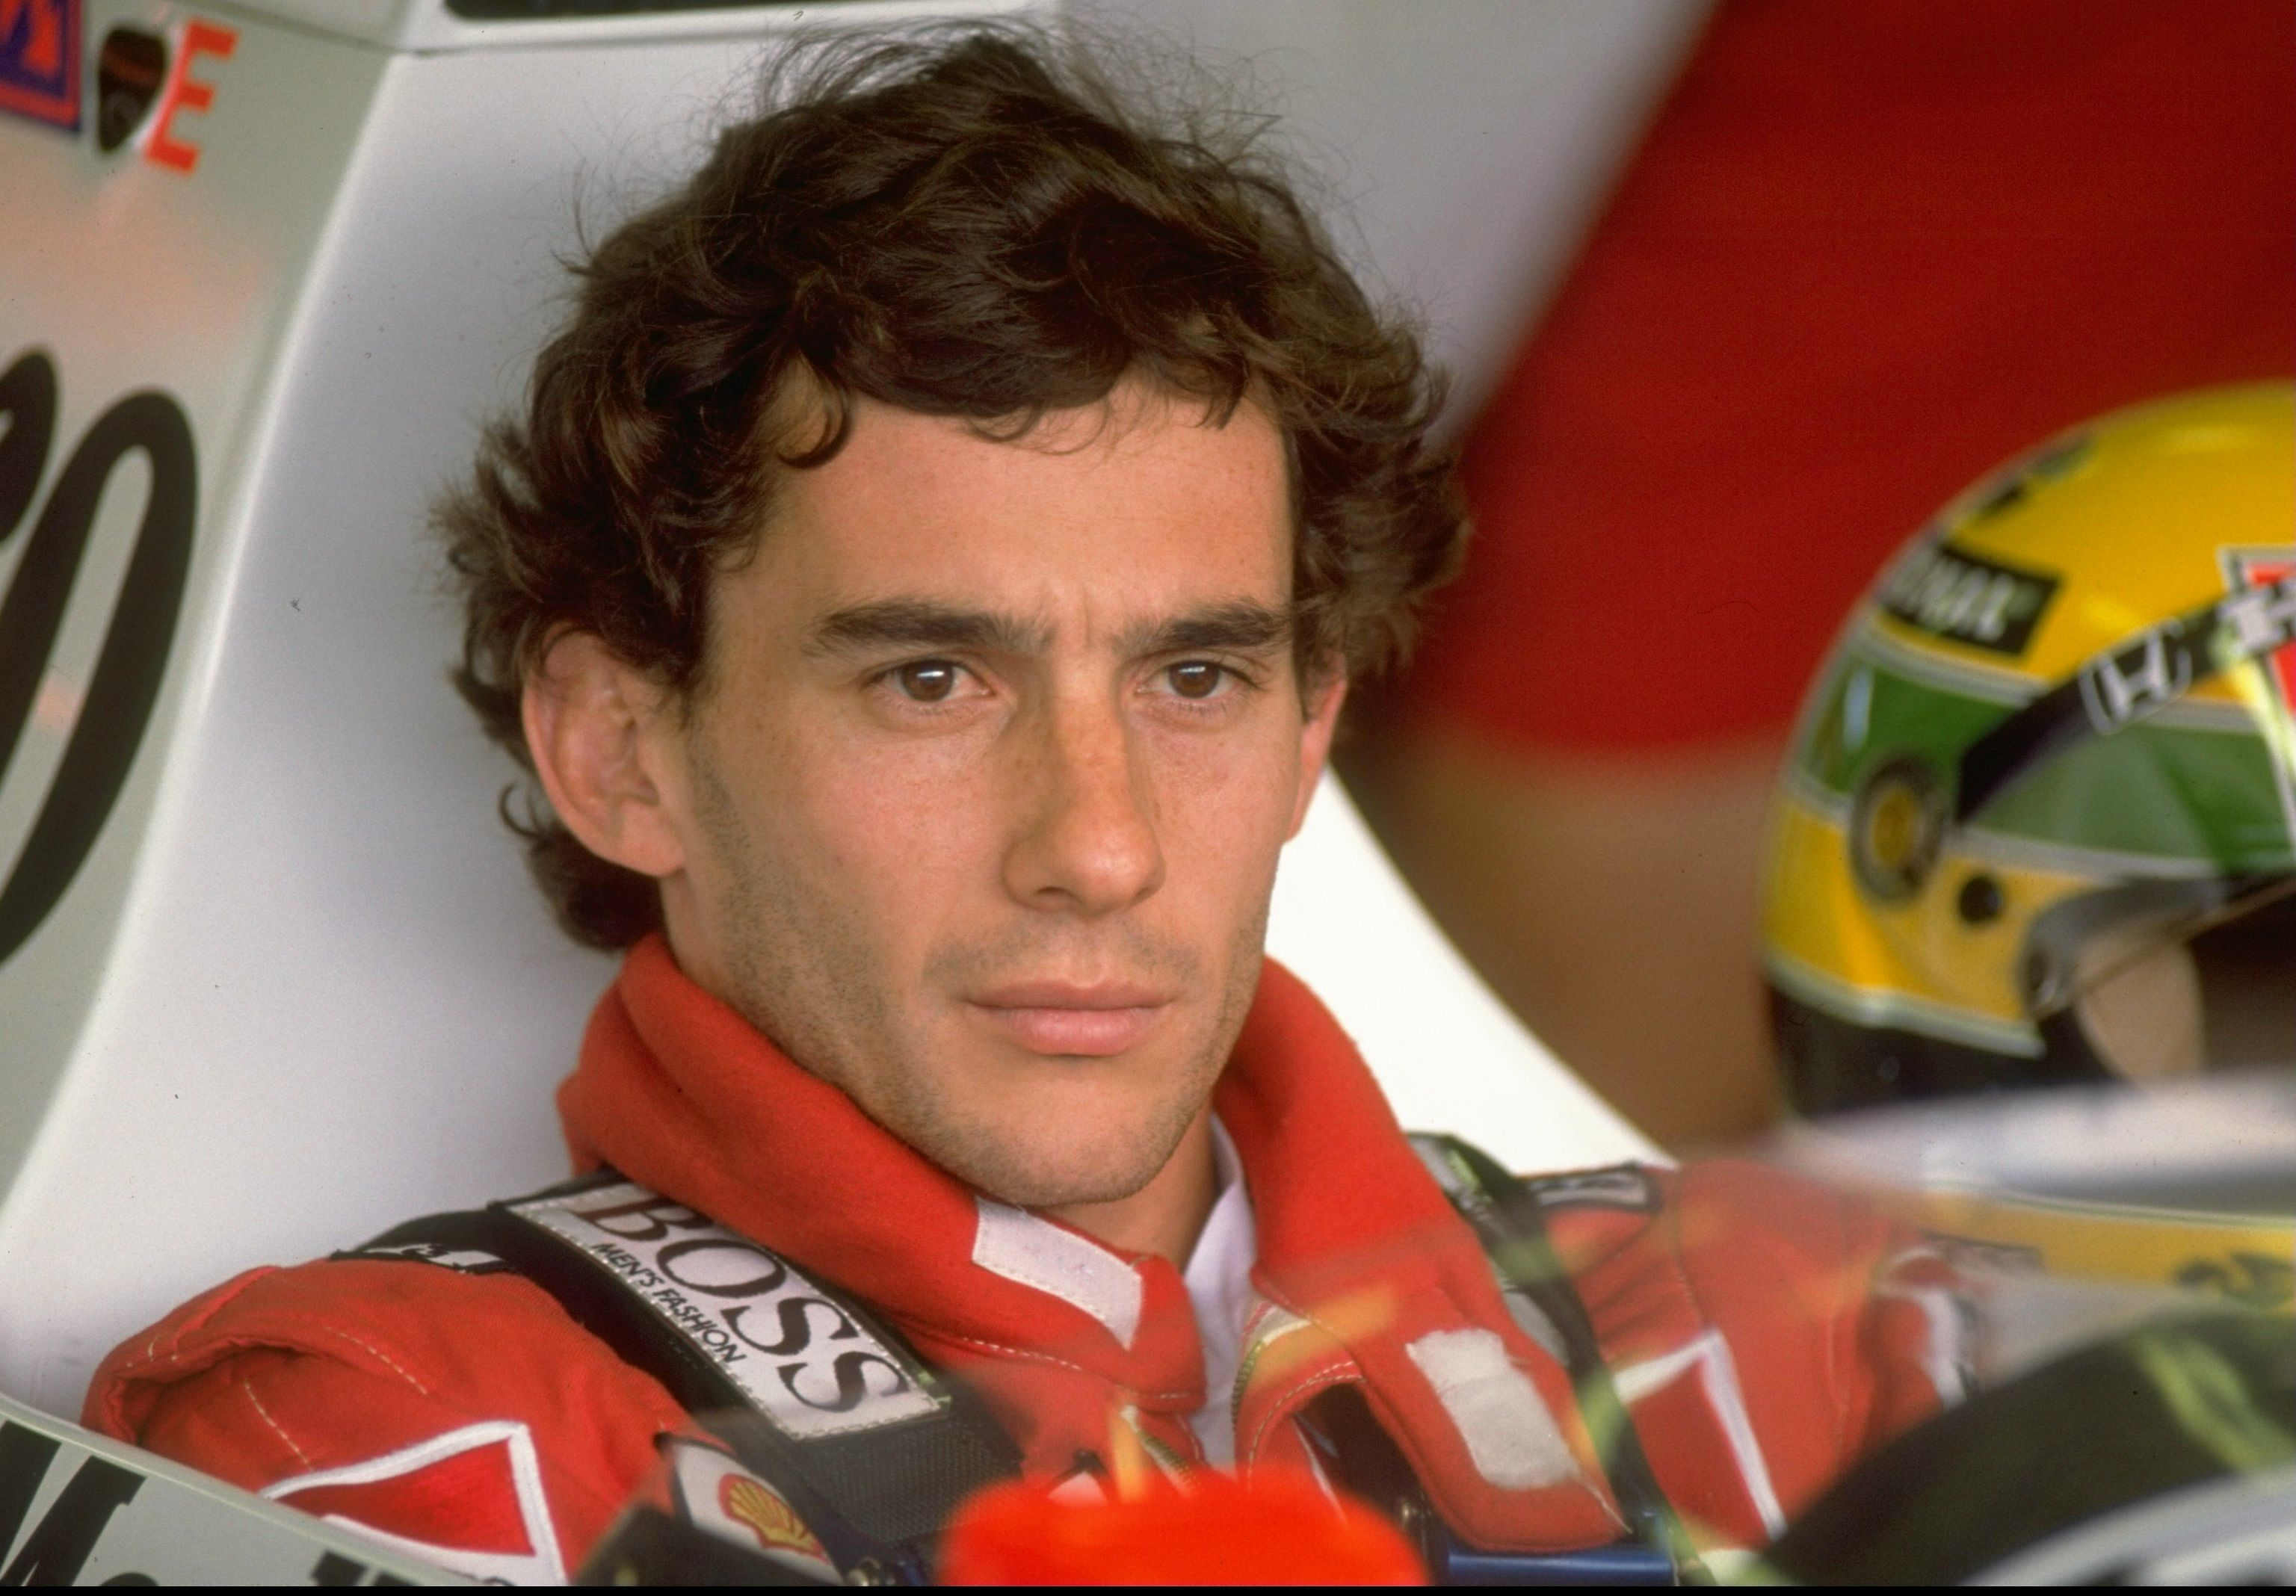 Ayrton Senna - an unparalleled hero